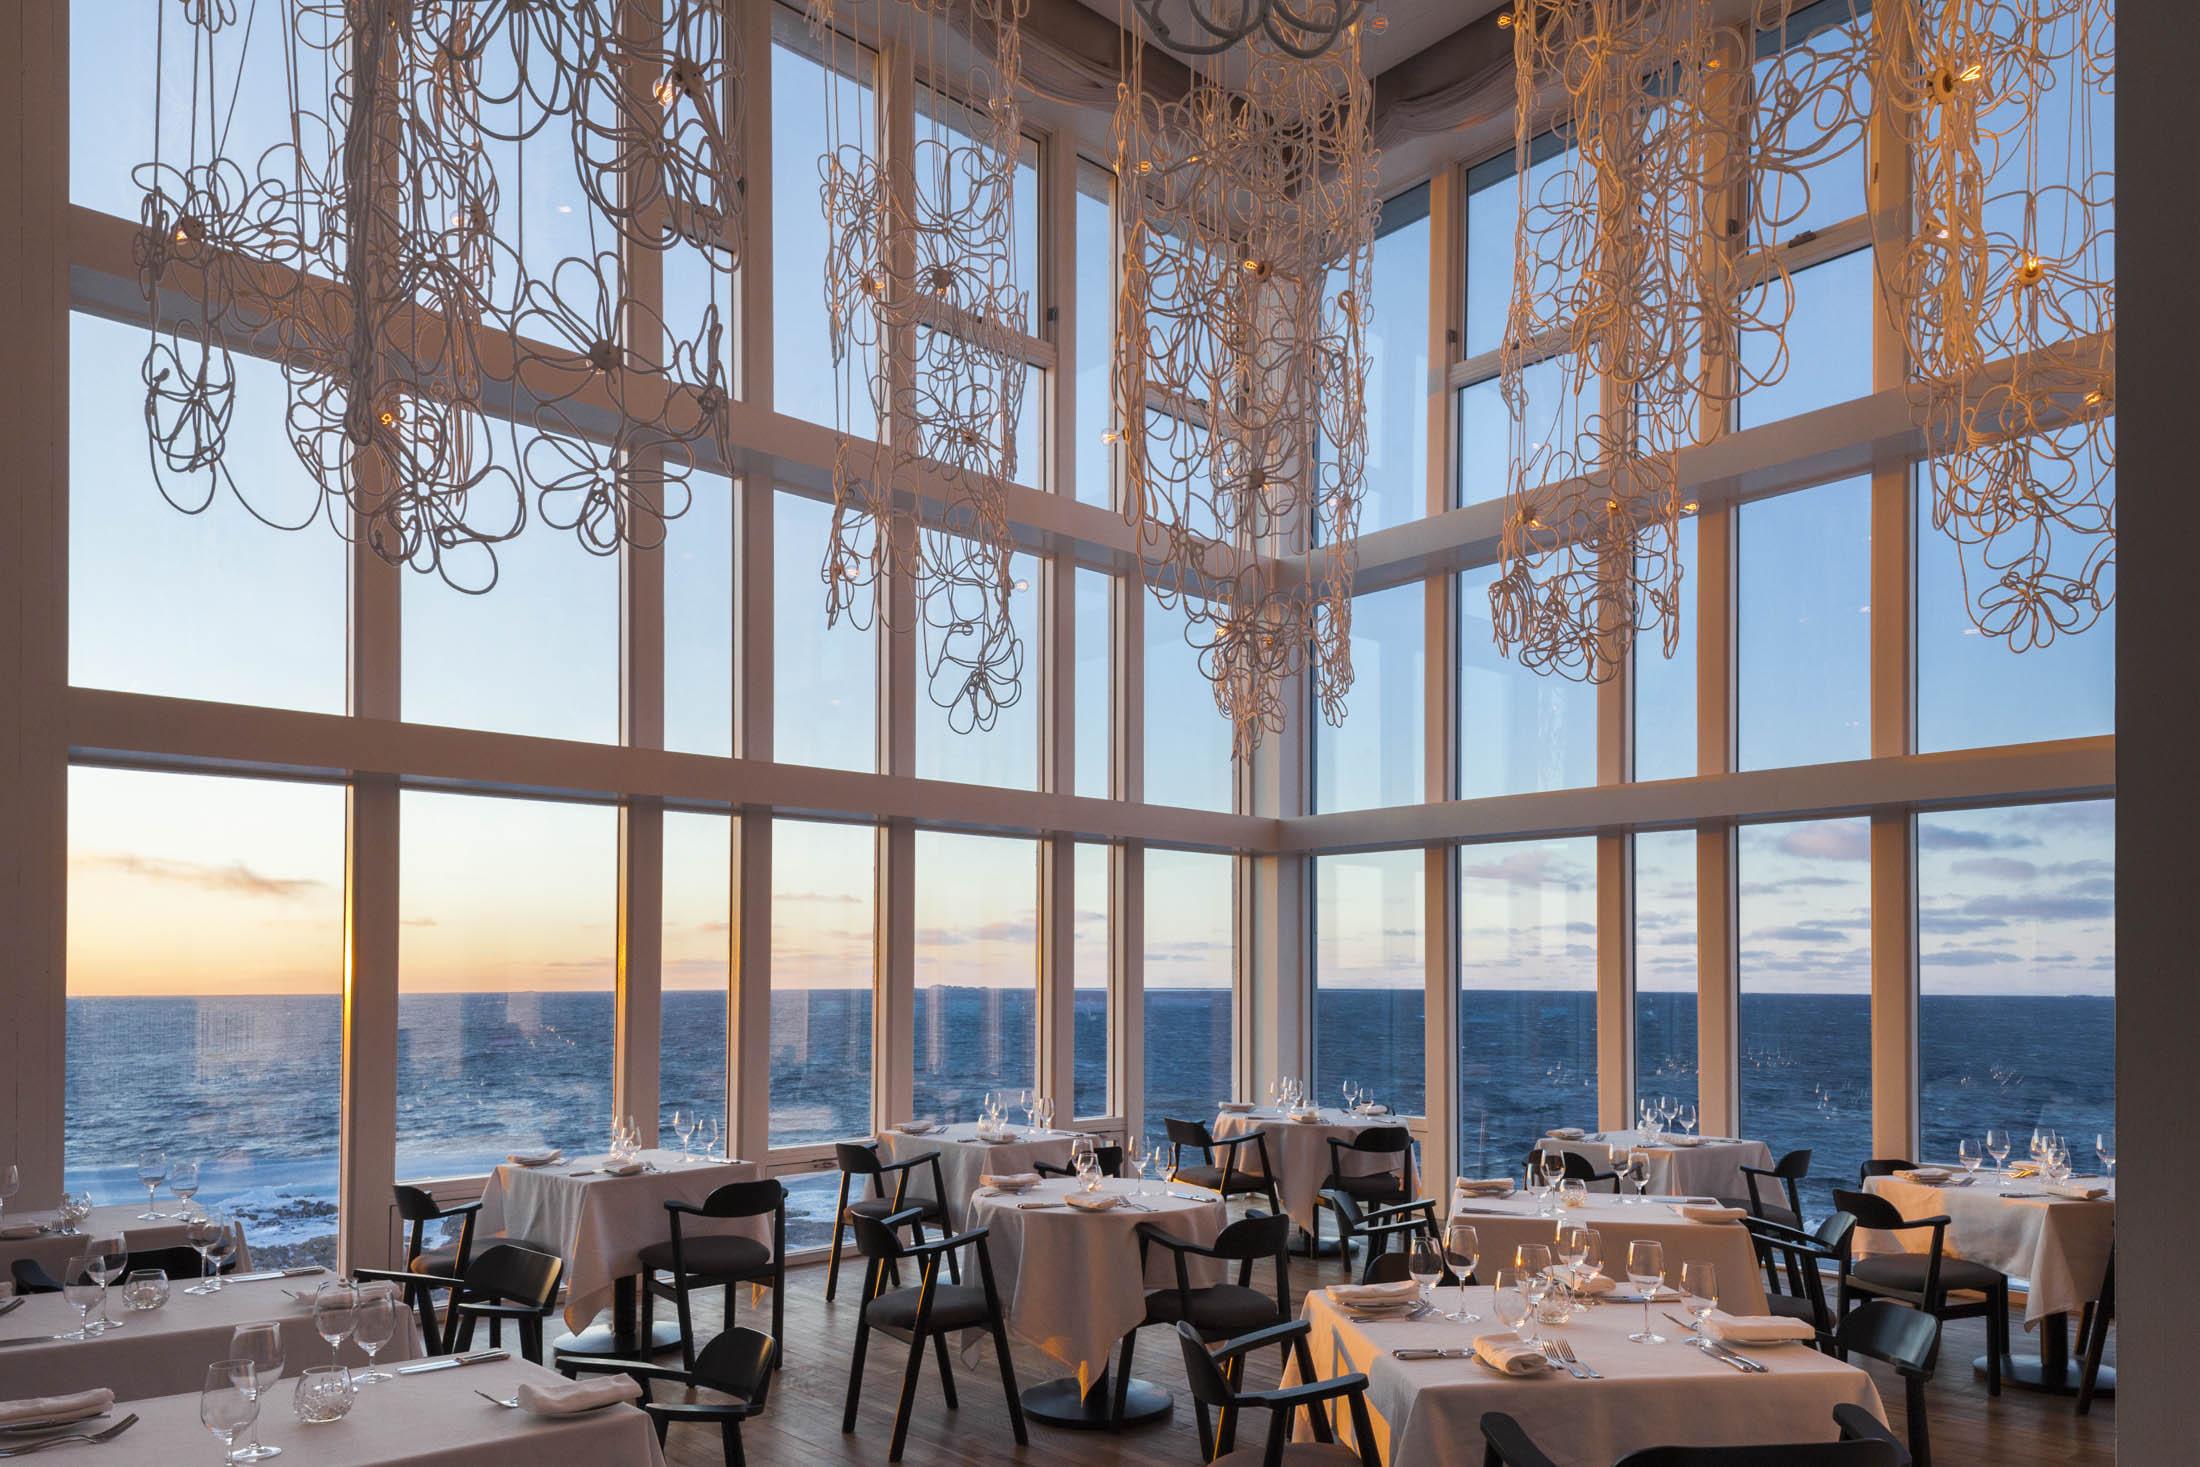 fogo-island-inn-dining-room-newfoundland-bloomberg-pursuits-wide